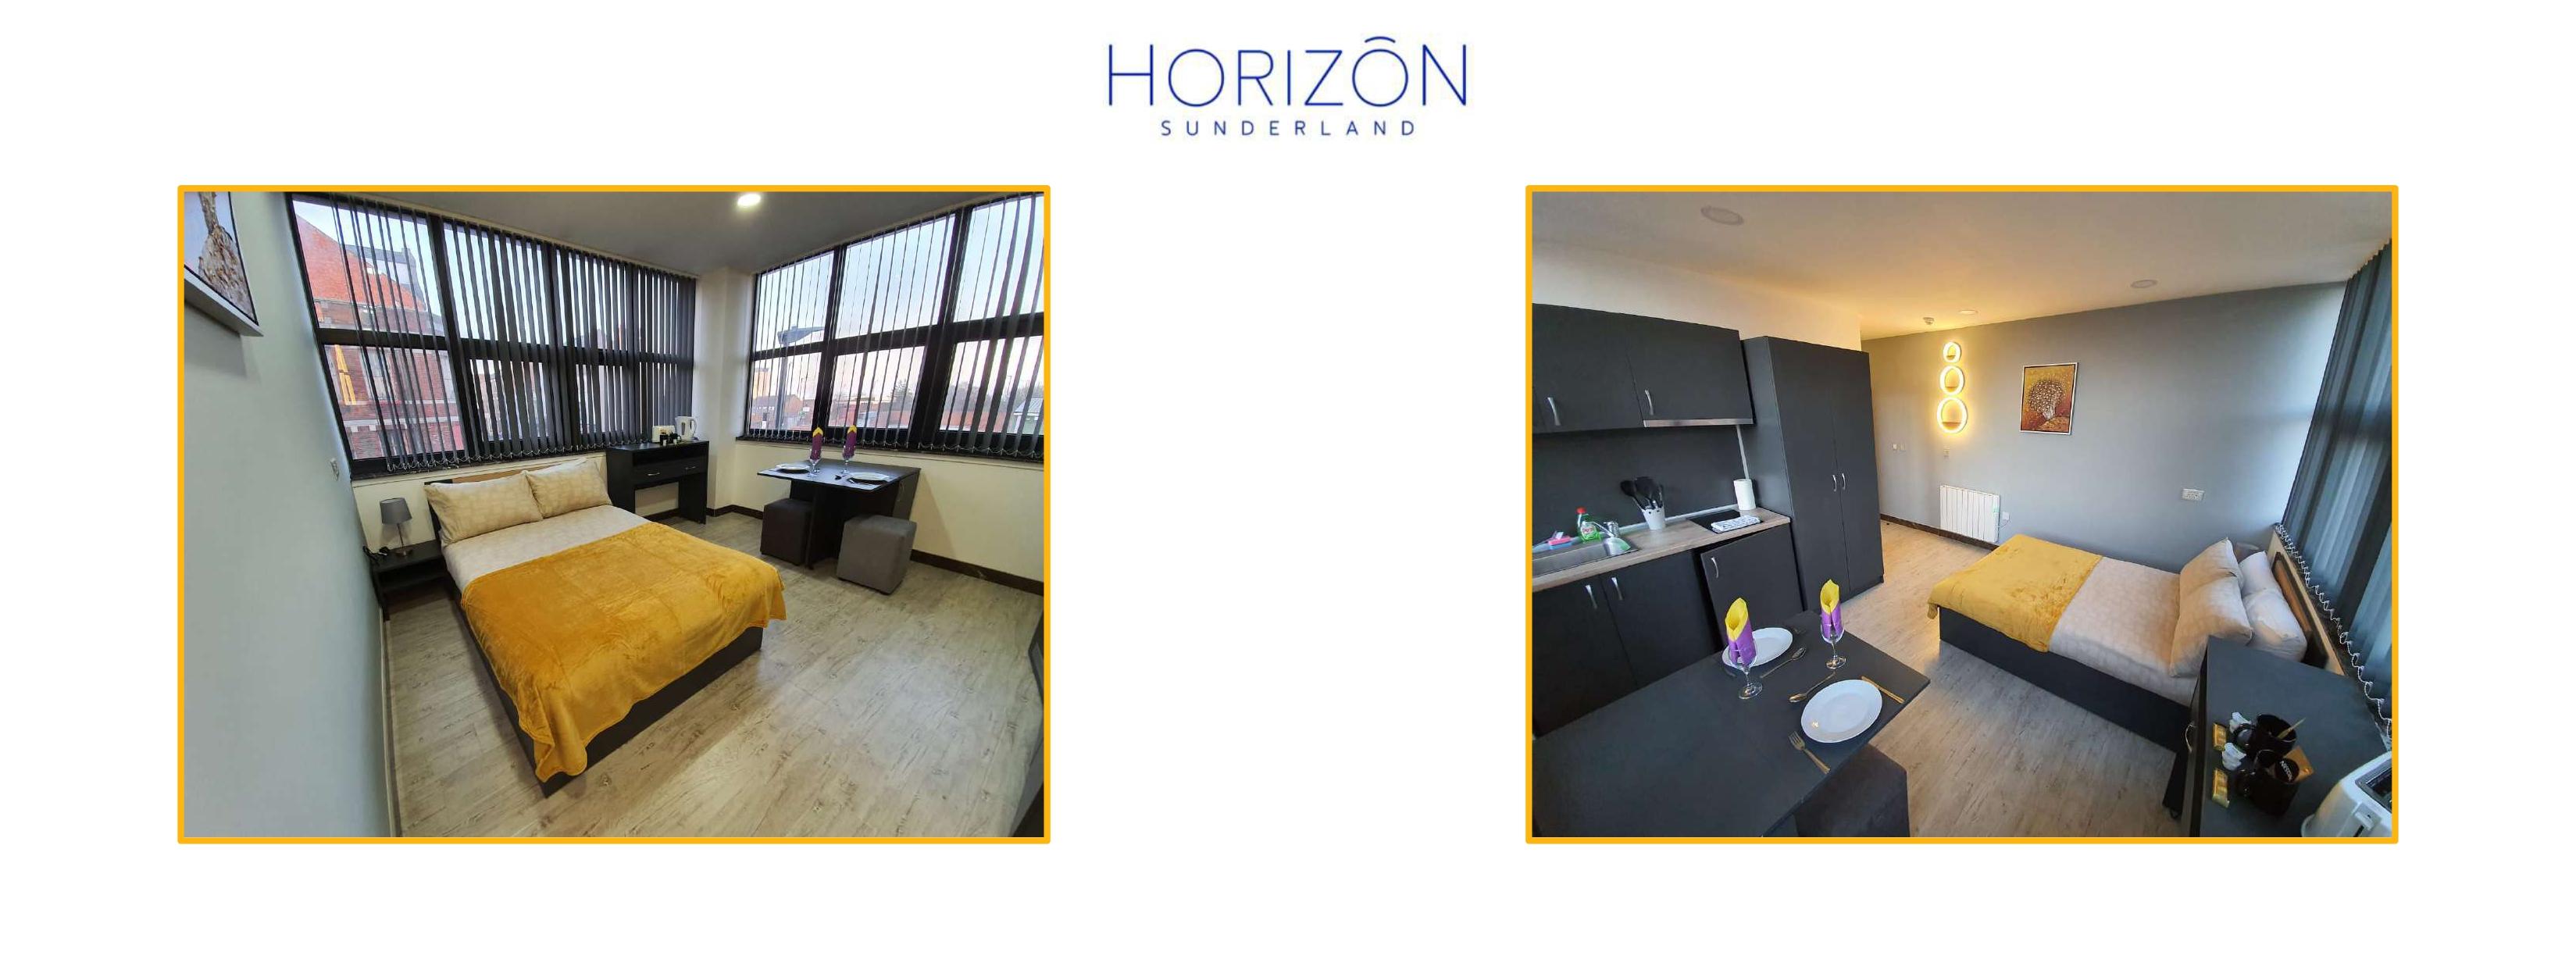 Horizon Sunderland -Ahmet Ziyal_v02_page-0006